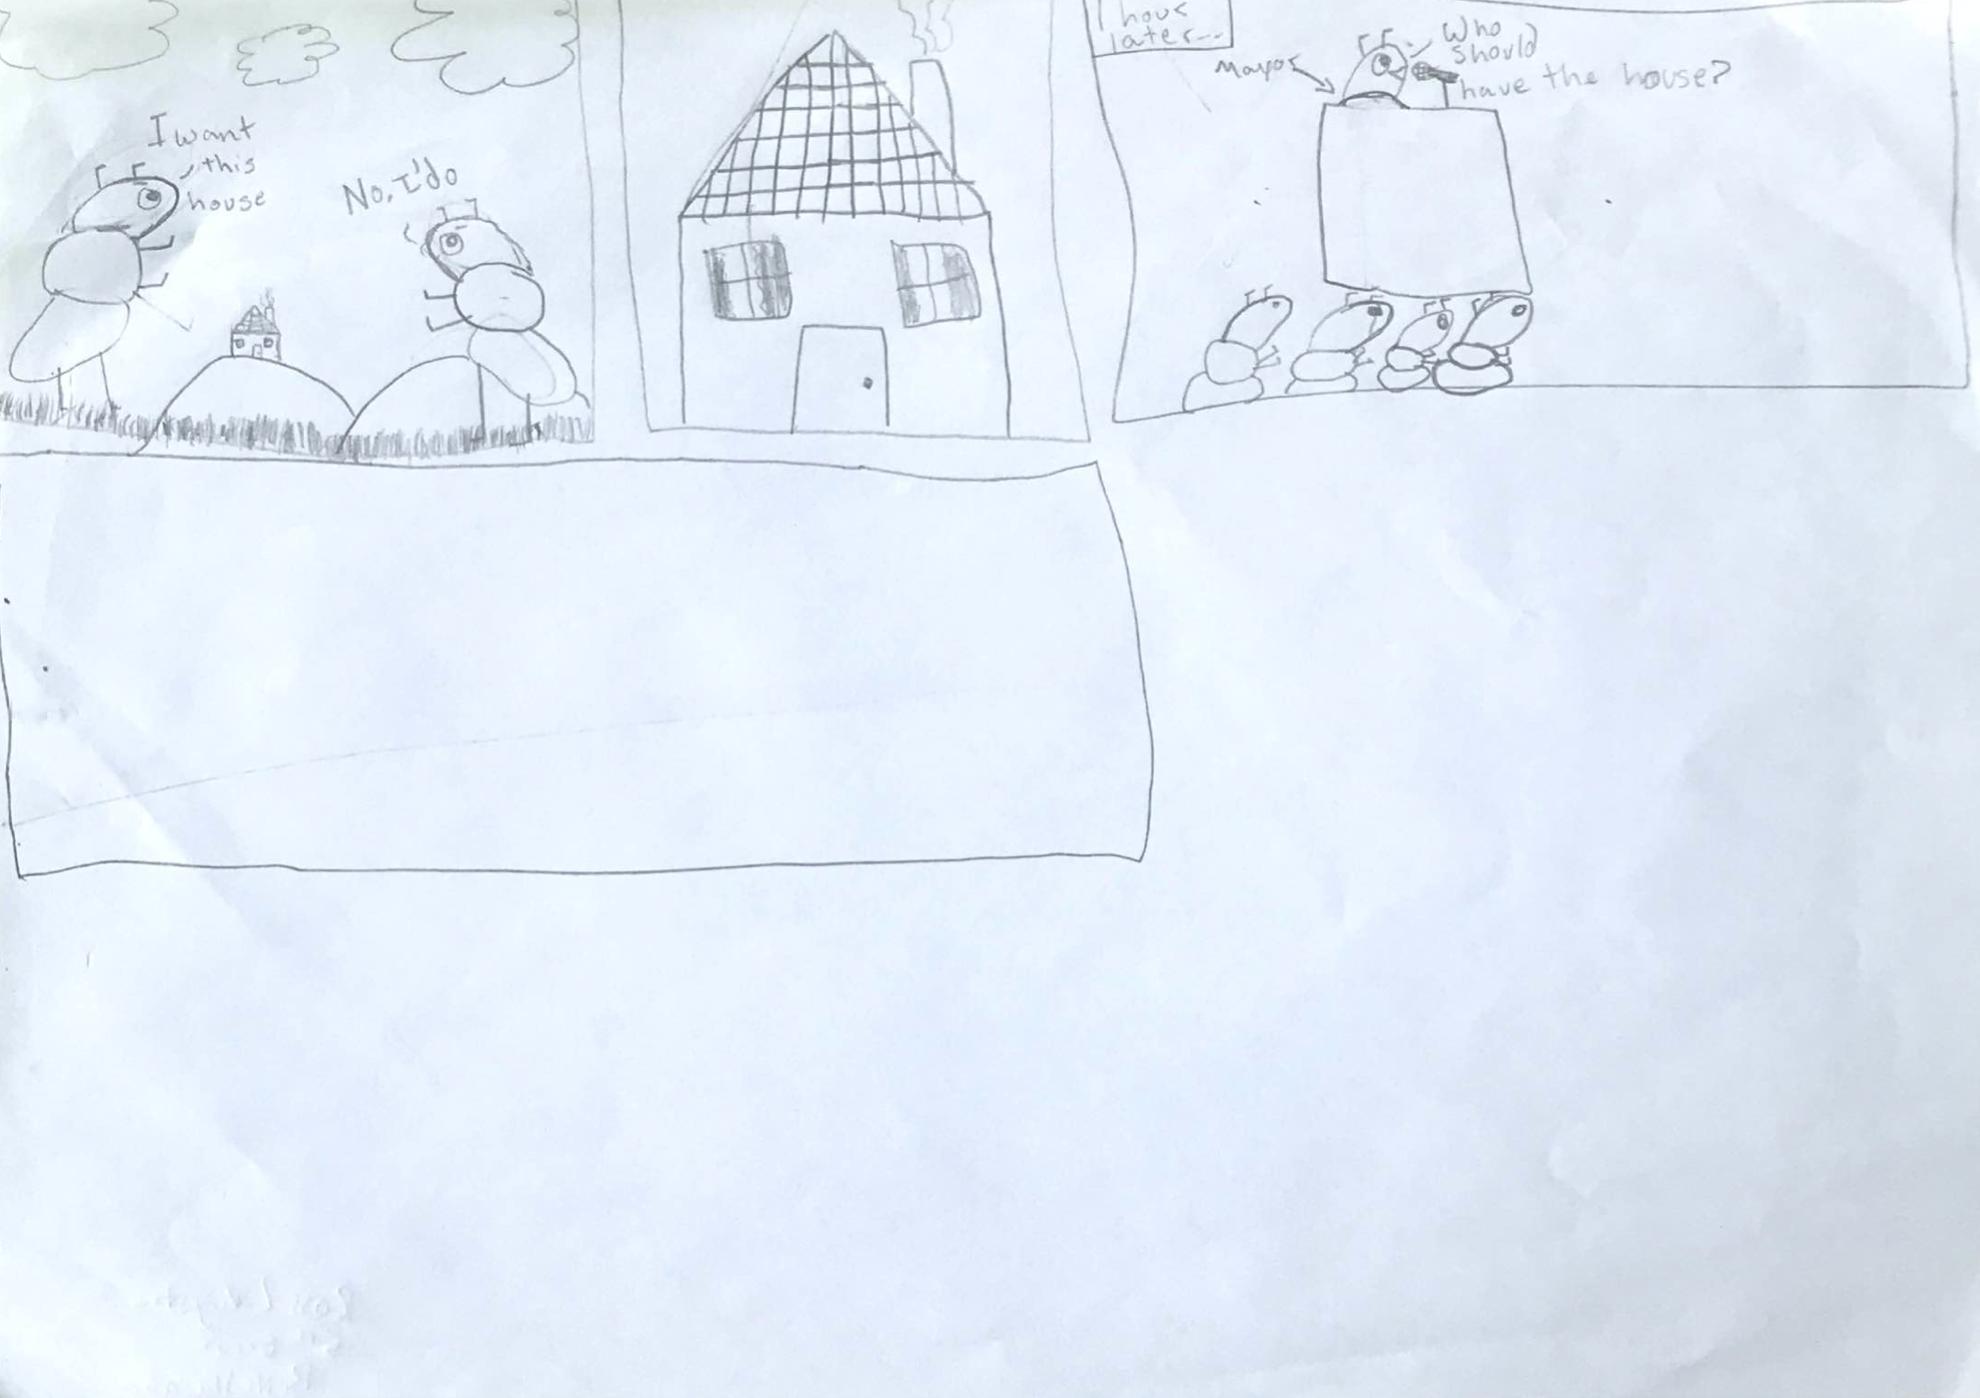 Rossi Livingston - Age 10